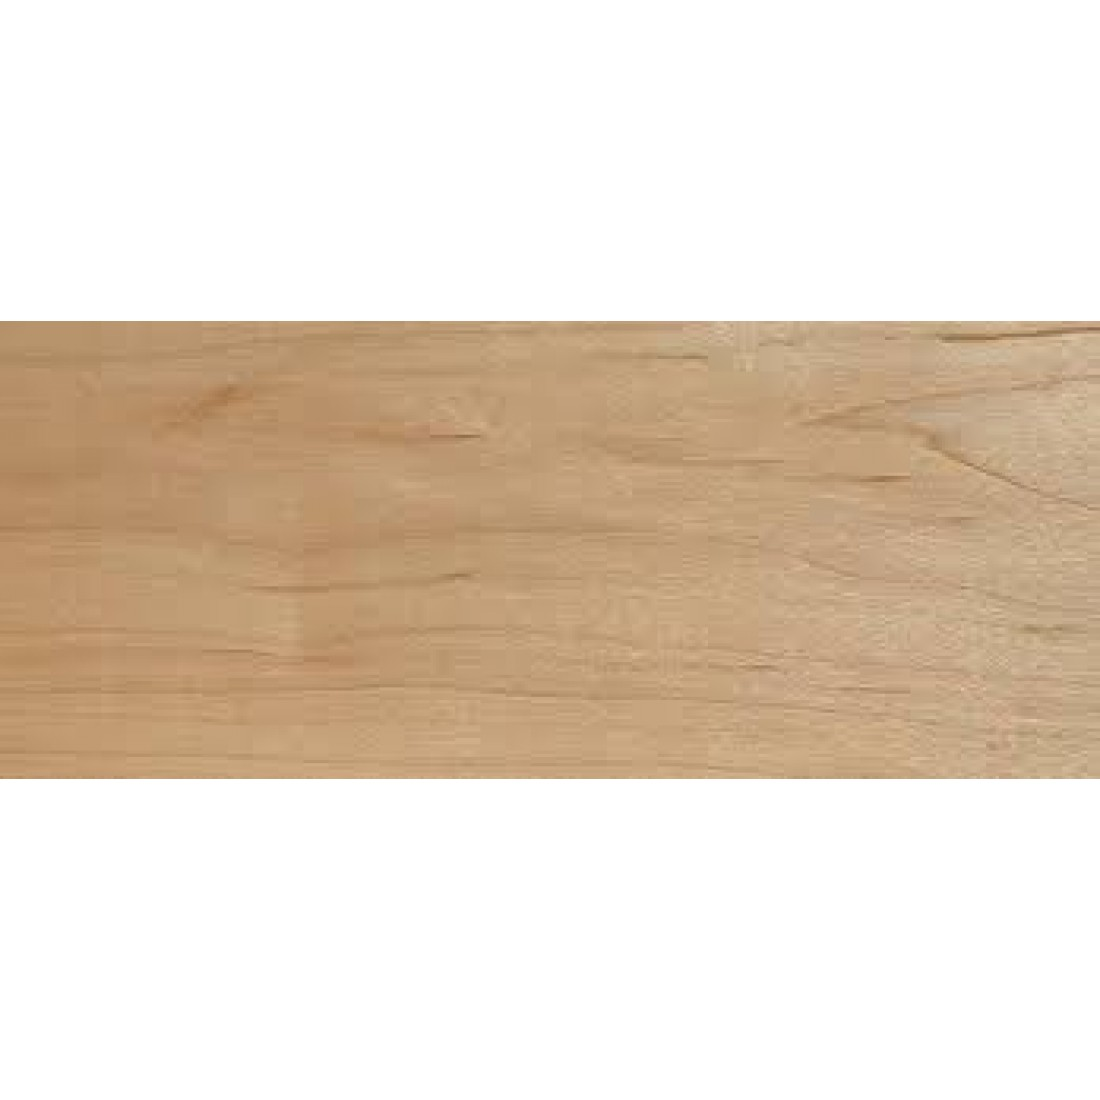 Marine Wbp Plywood 2440x1220x18mm